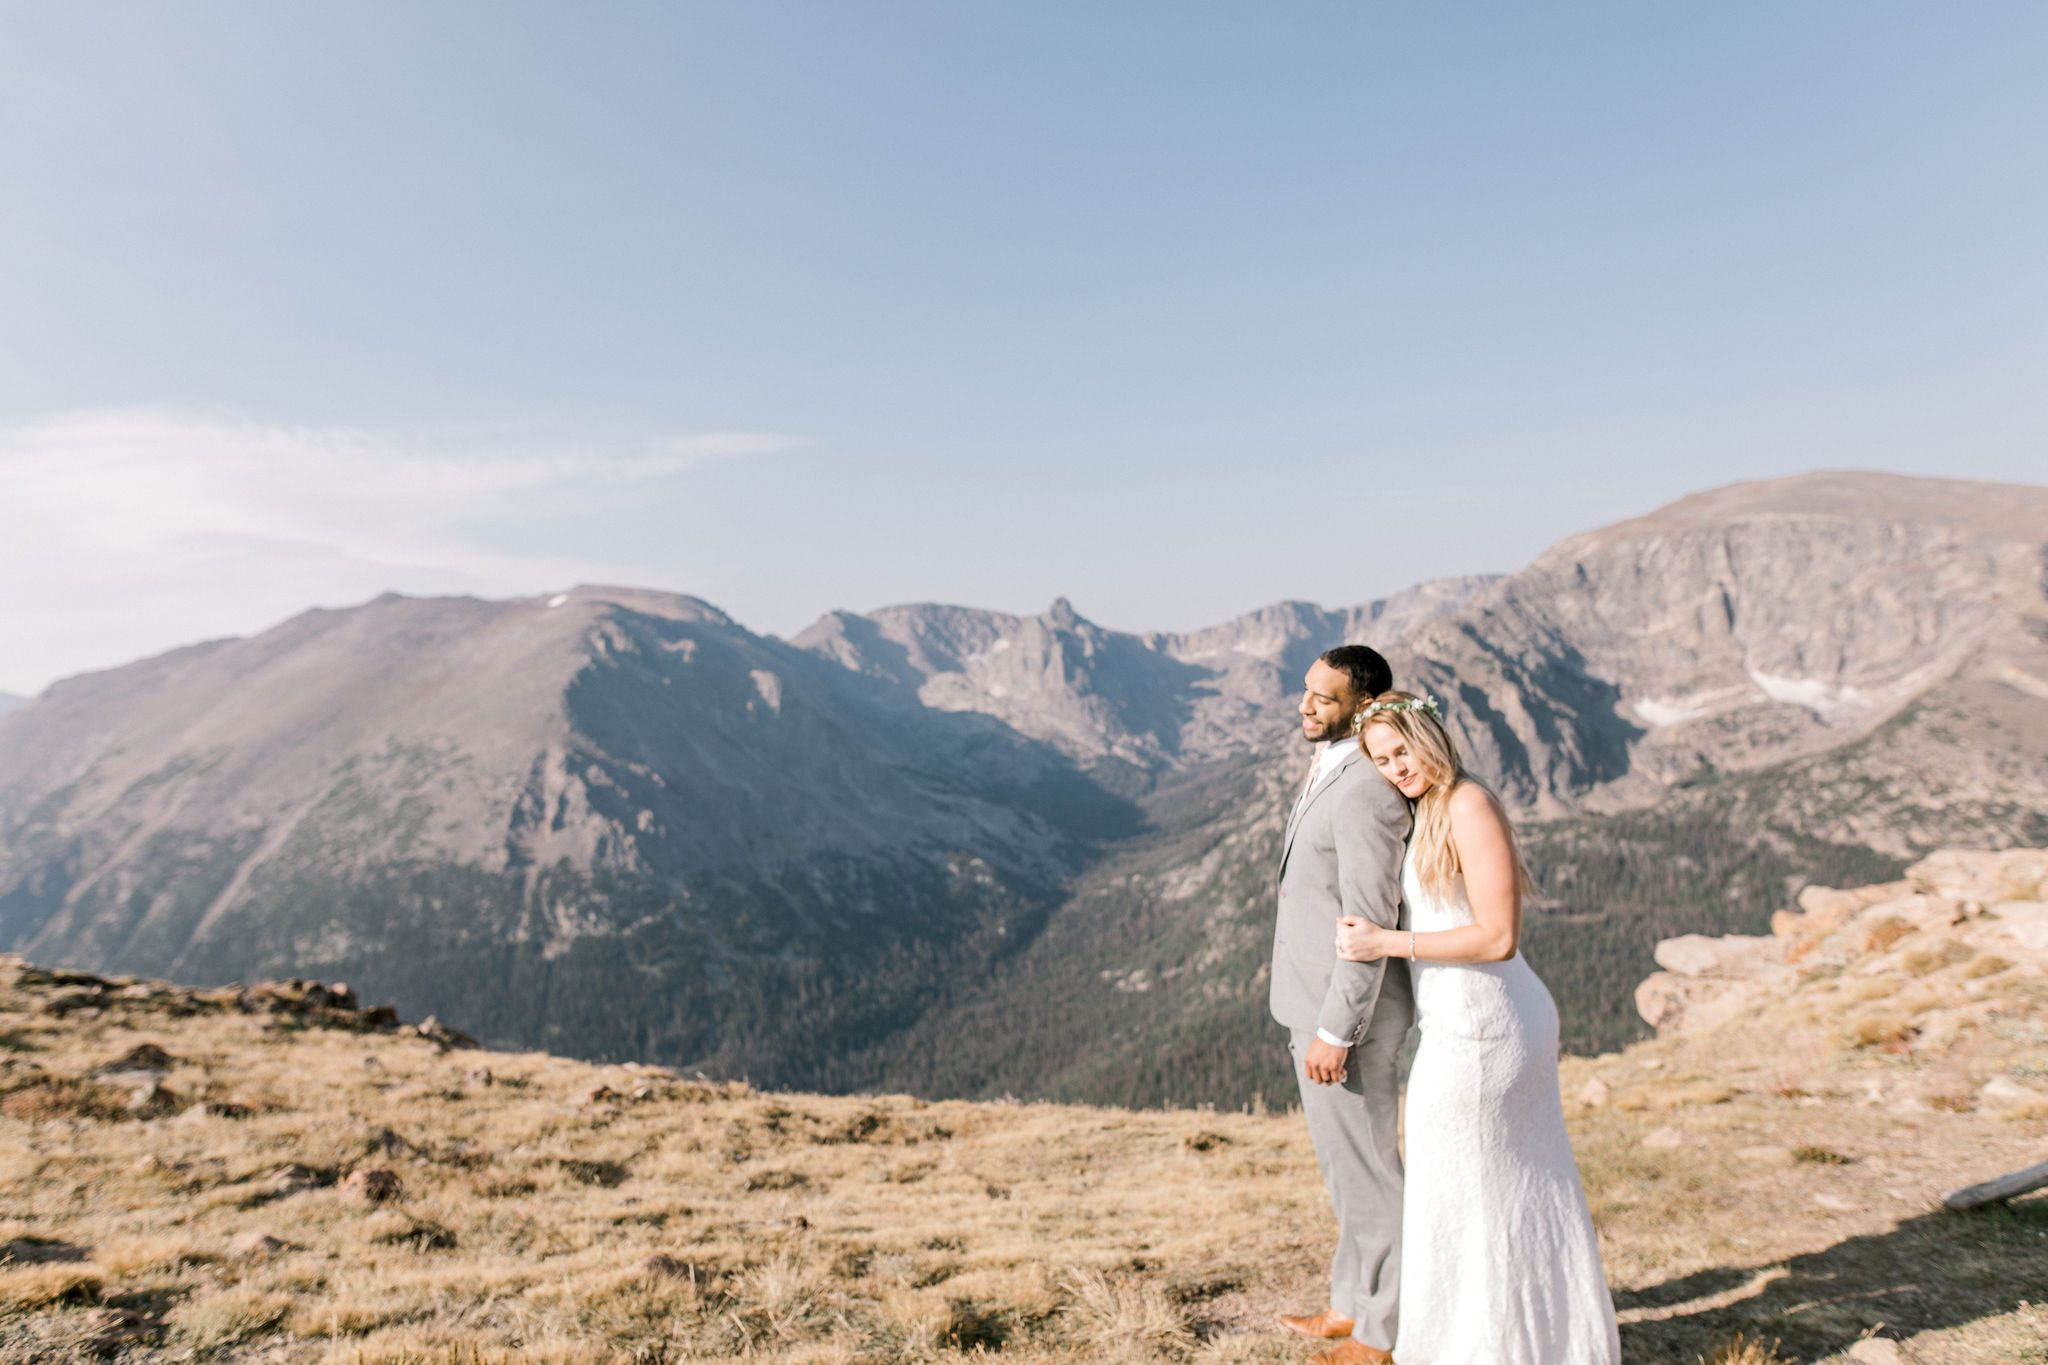 Mountain Elopement Mountain elopement, Mountain wedding